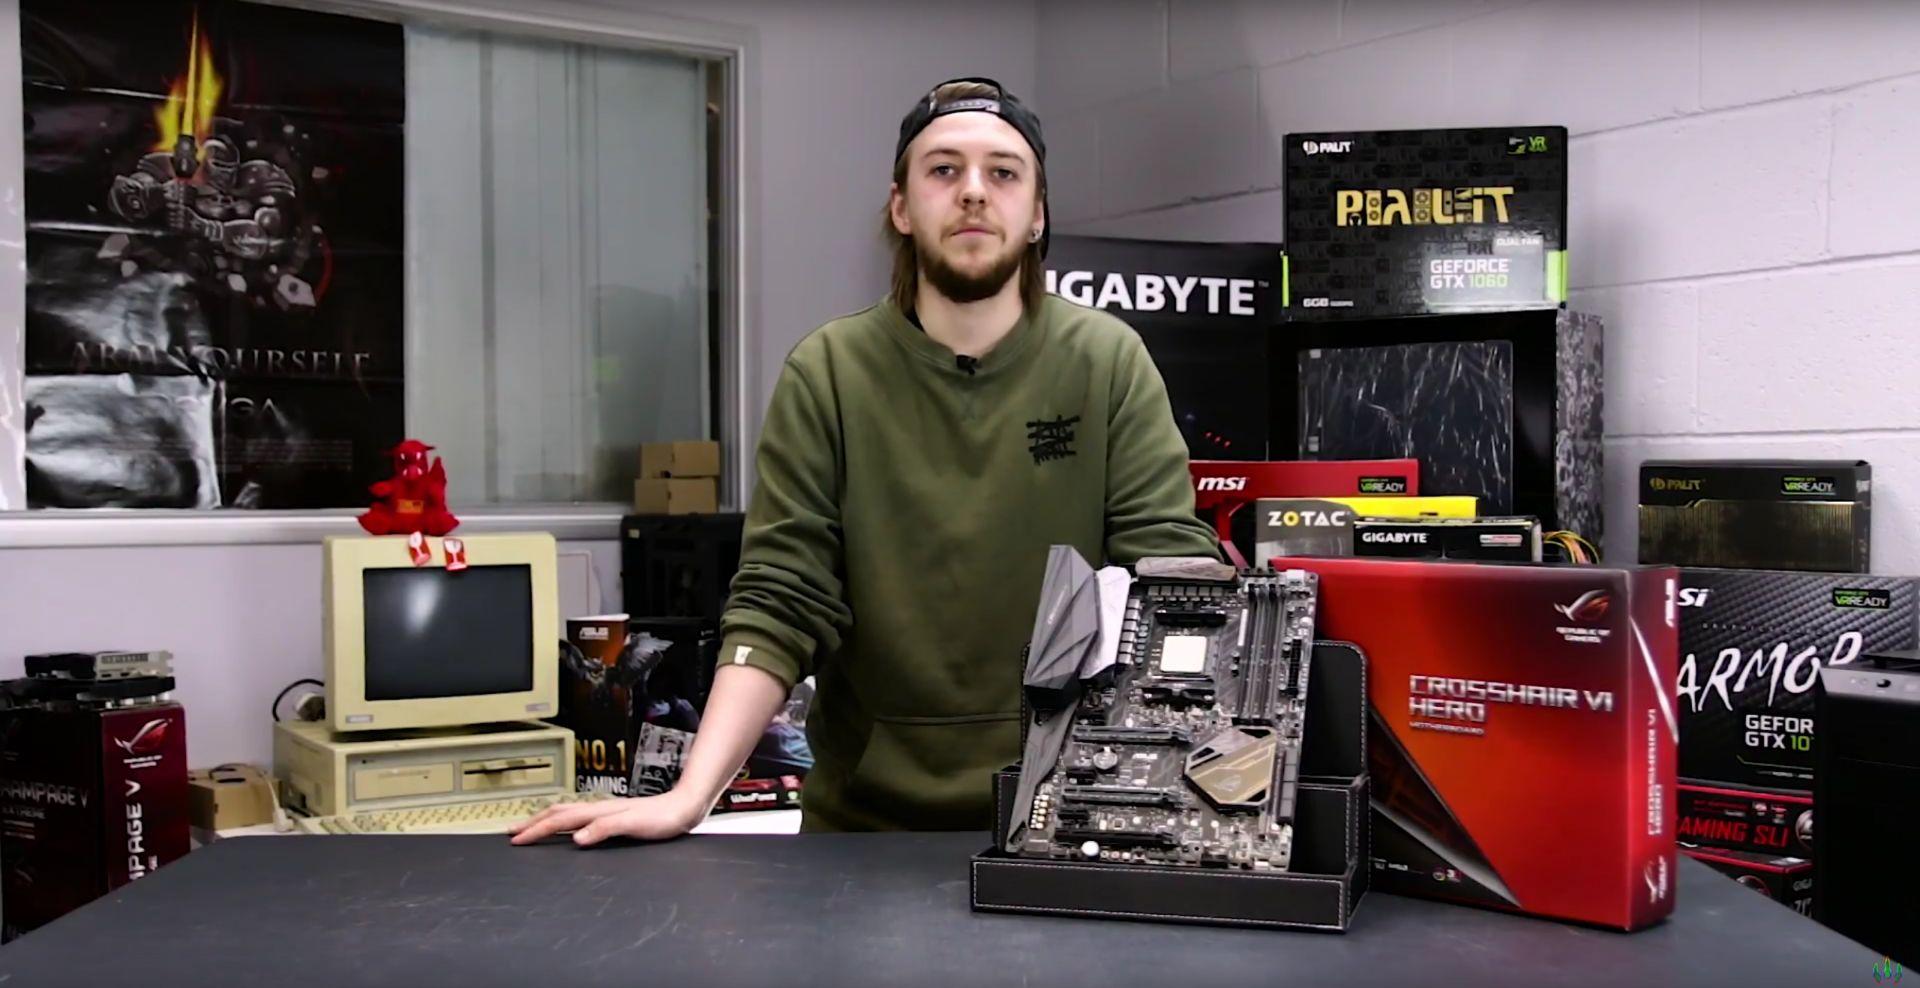 AMD-Ryzen-7-1700-vs-Core-i7-7700K-DinoPC-1920x988